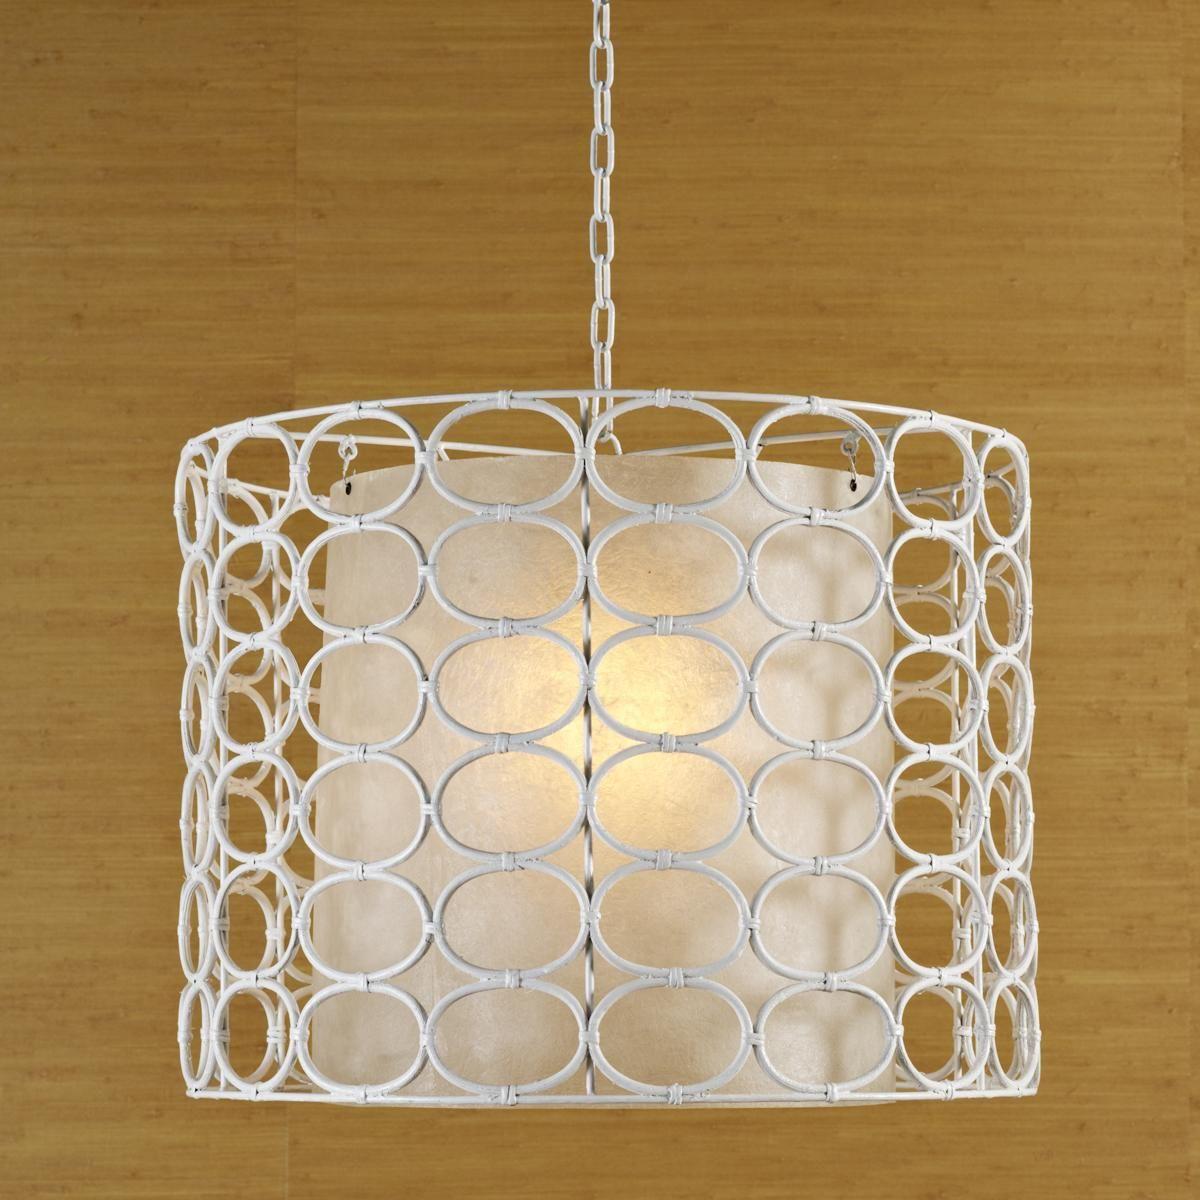 used pendant lighting. Oval Ring Drum Shade Pendant Used Lighting D